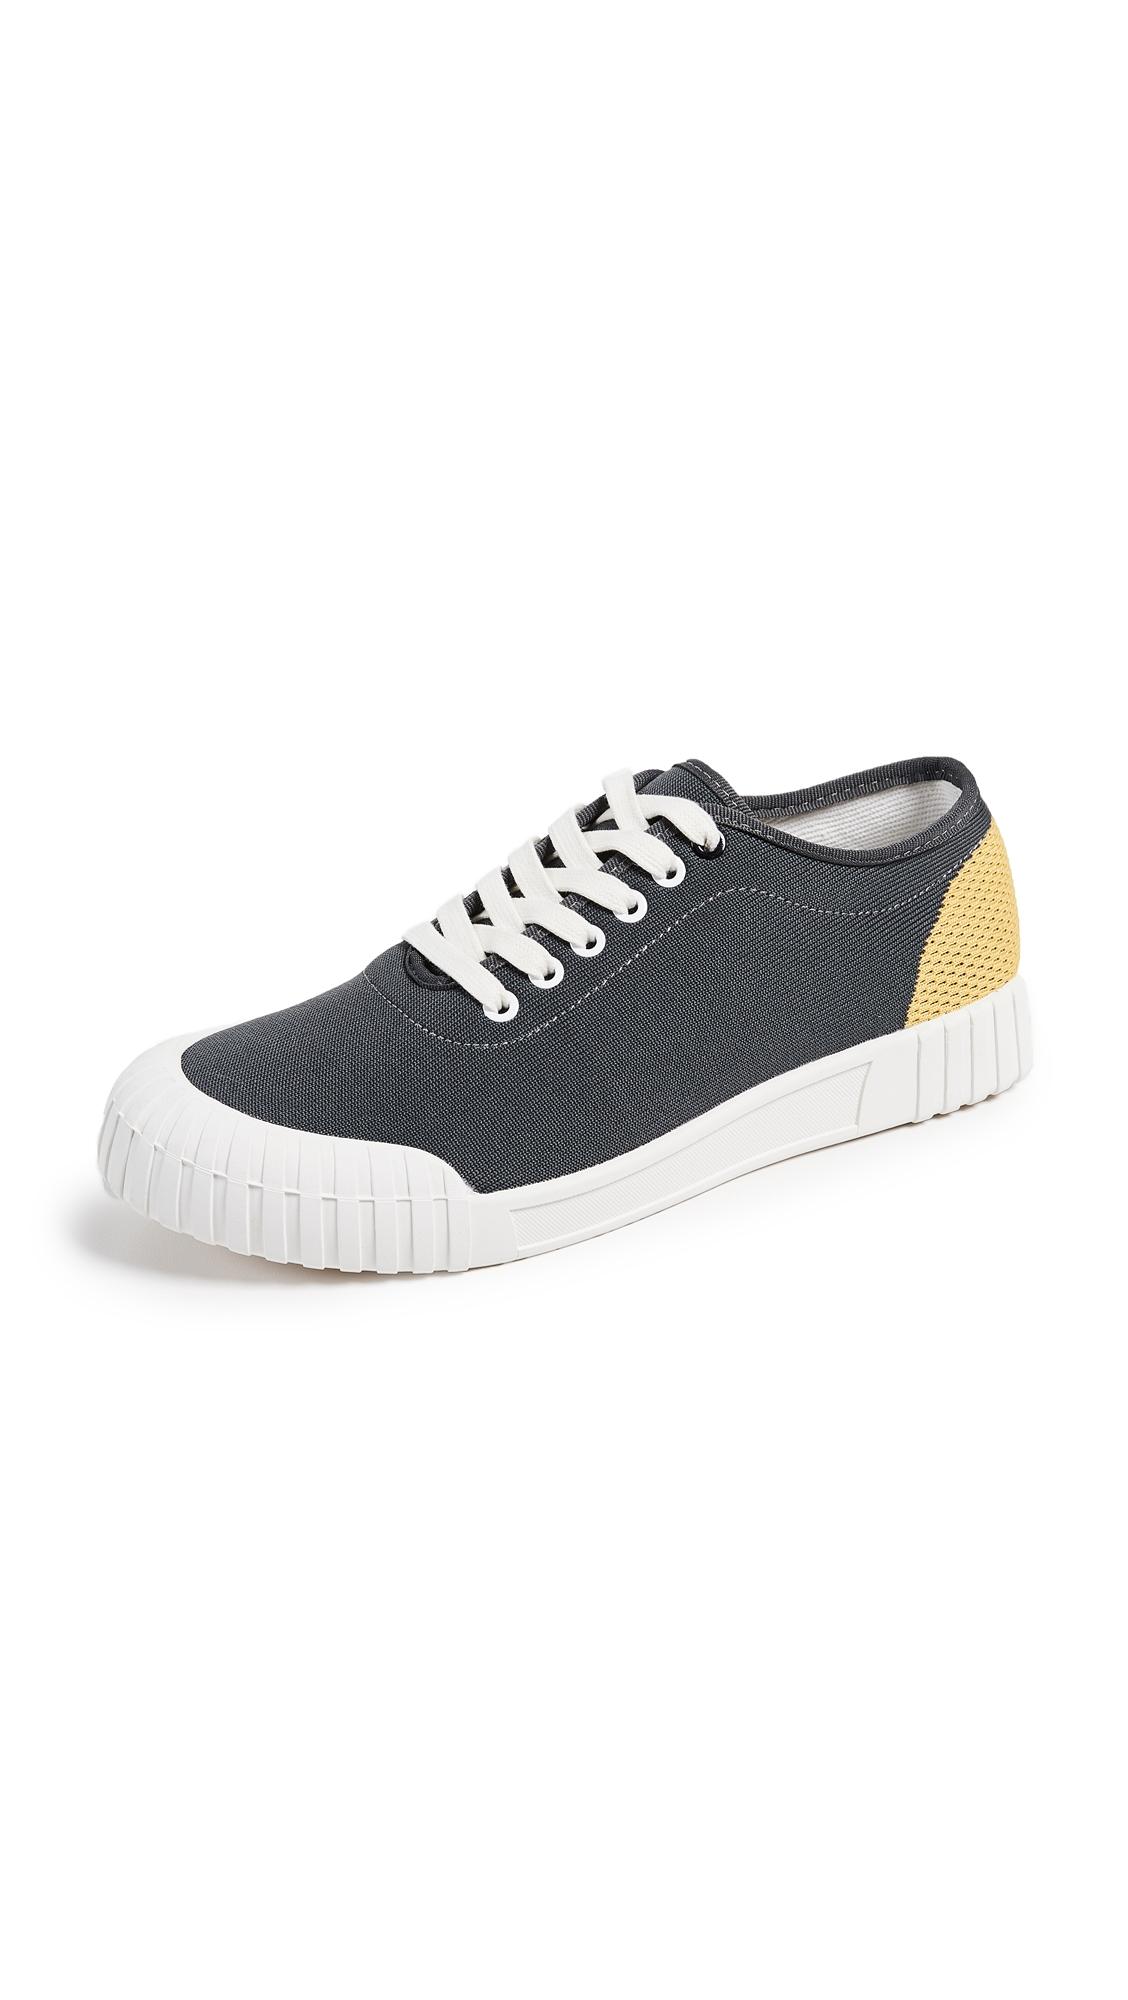 GOOD NEWS Gamer Low Top Sneakers in Grey/Yellow